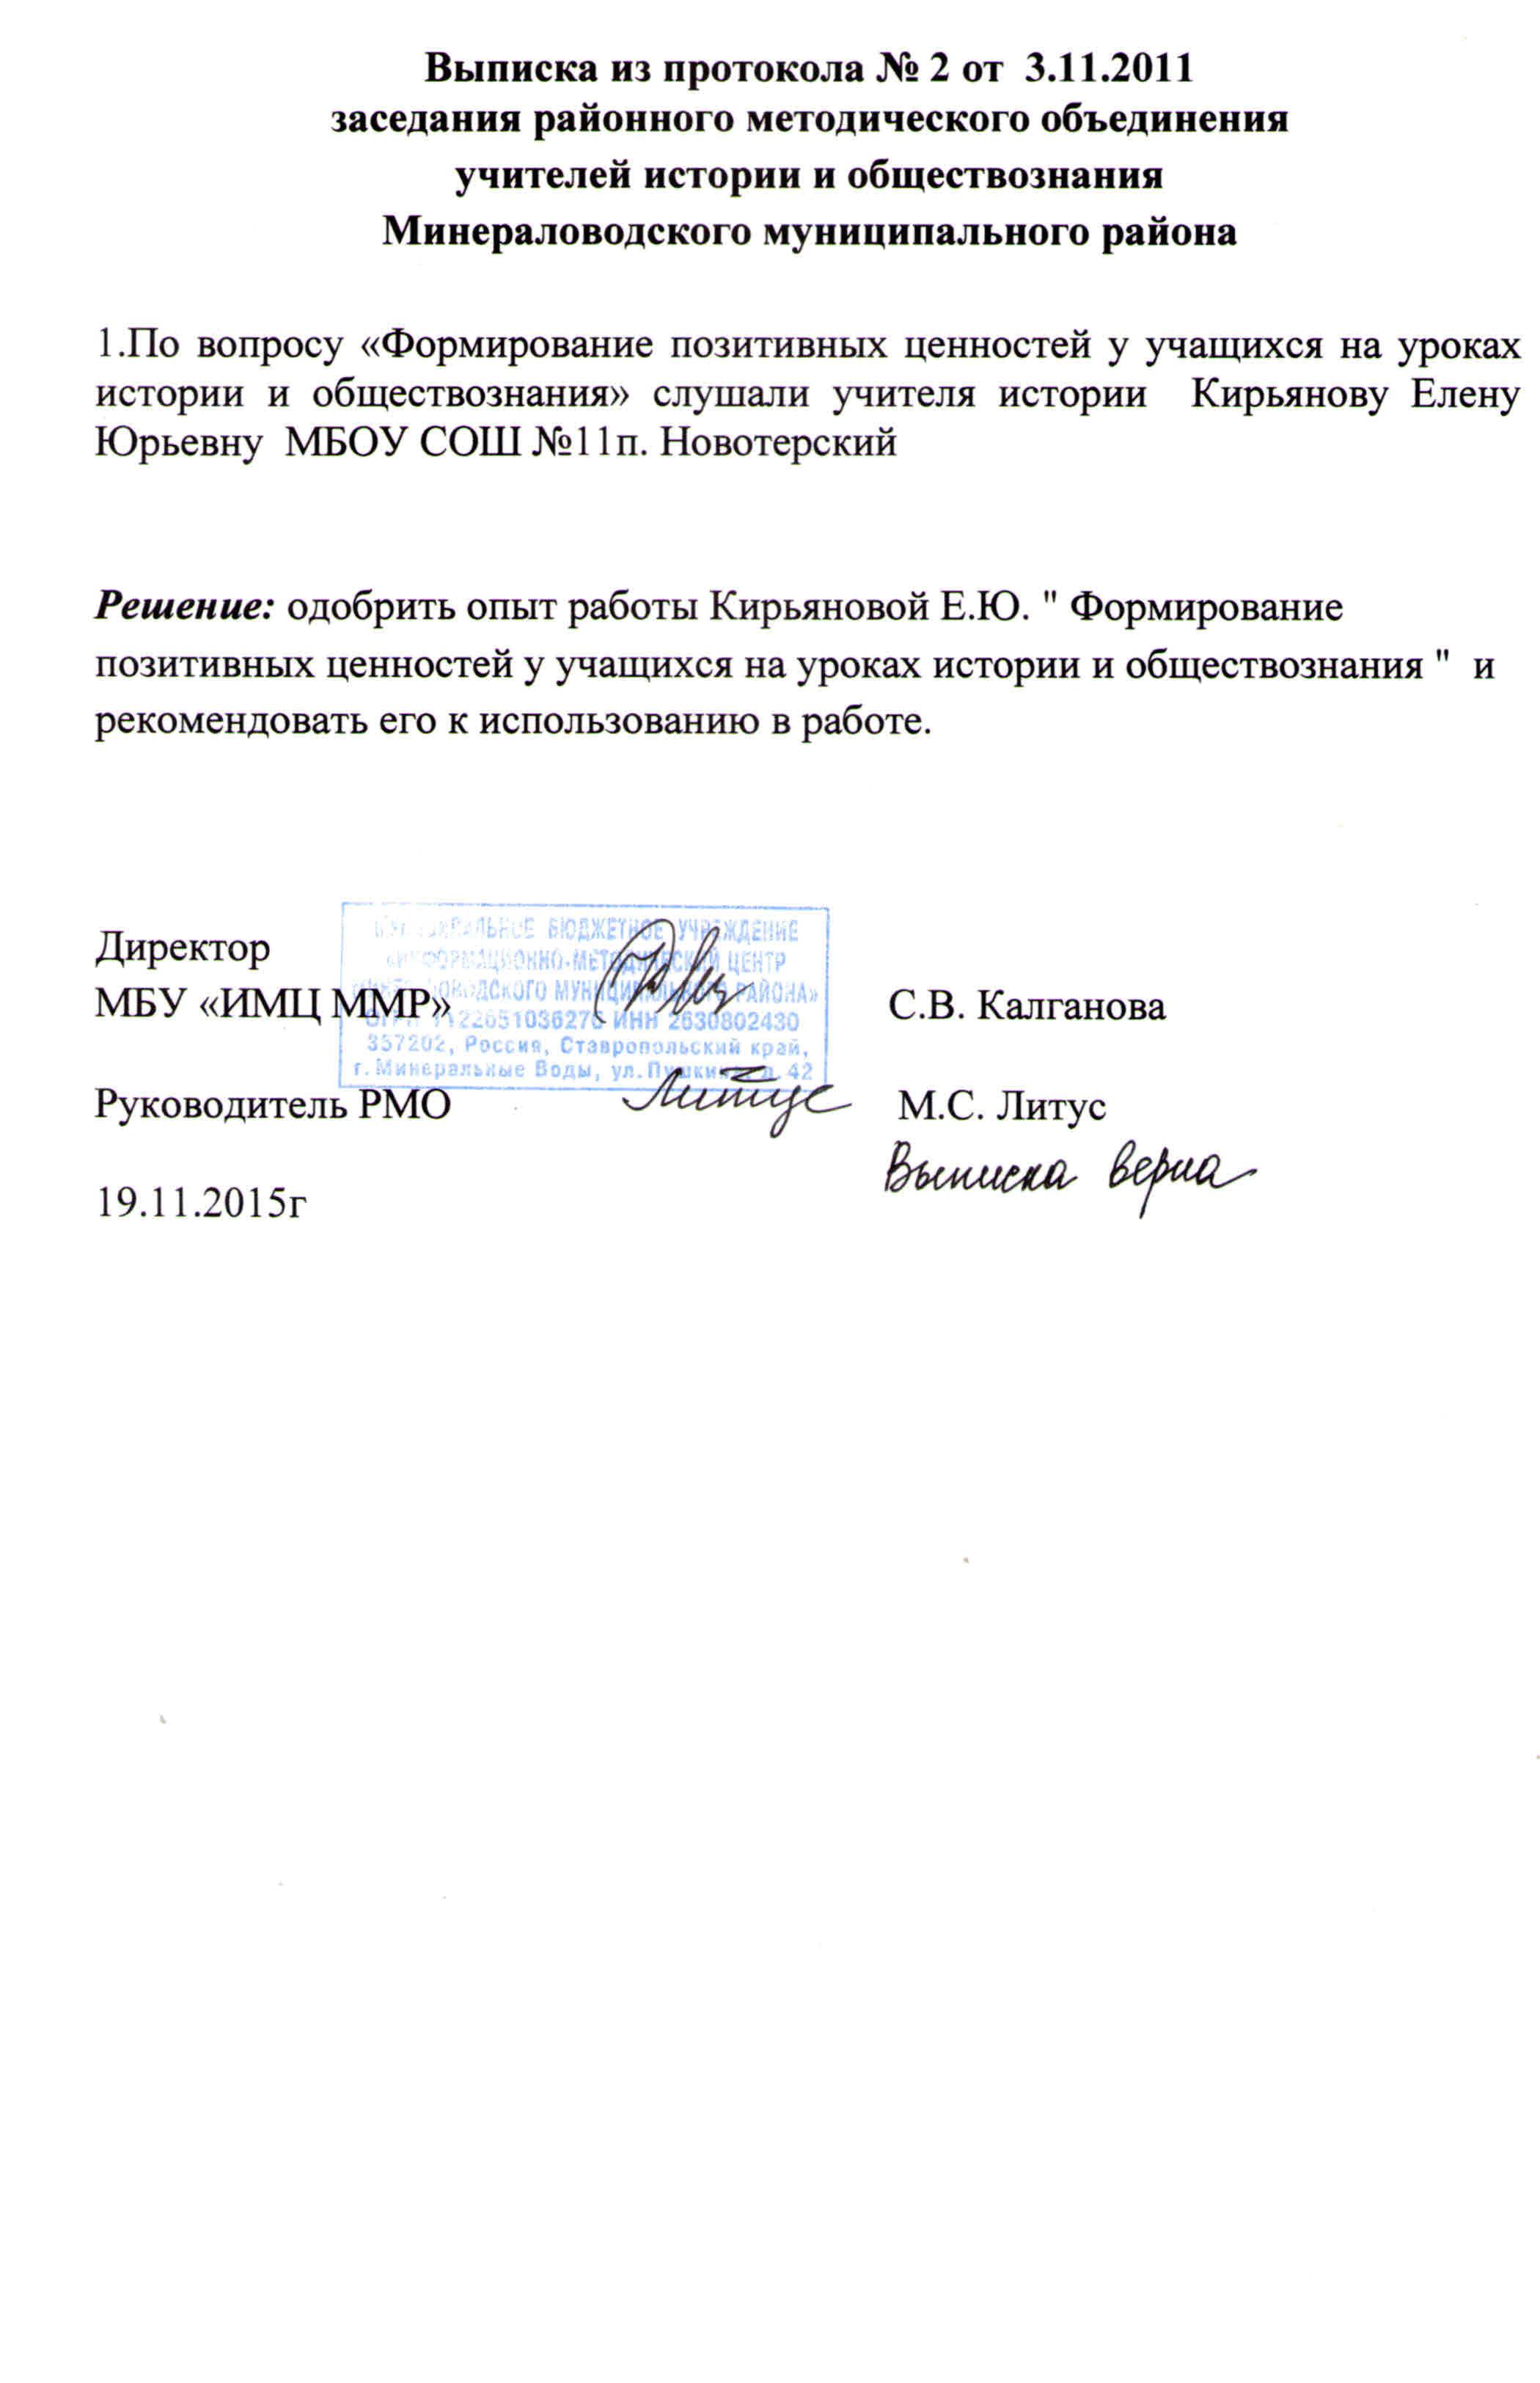 C:\Users\Сергей\Desktop\рмо\Document_6.jpg